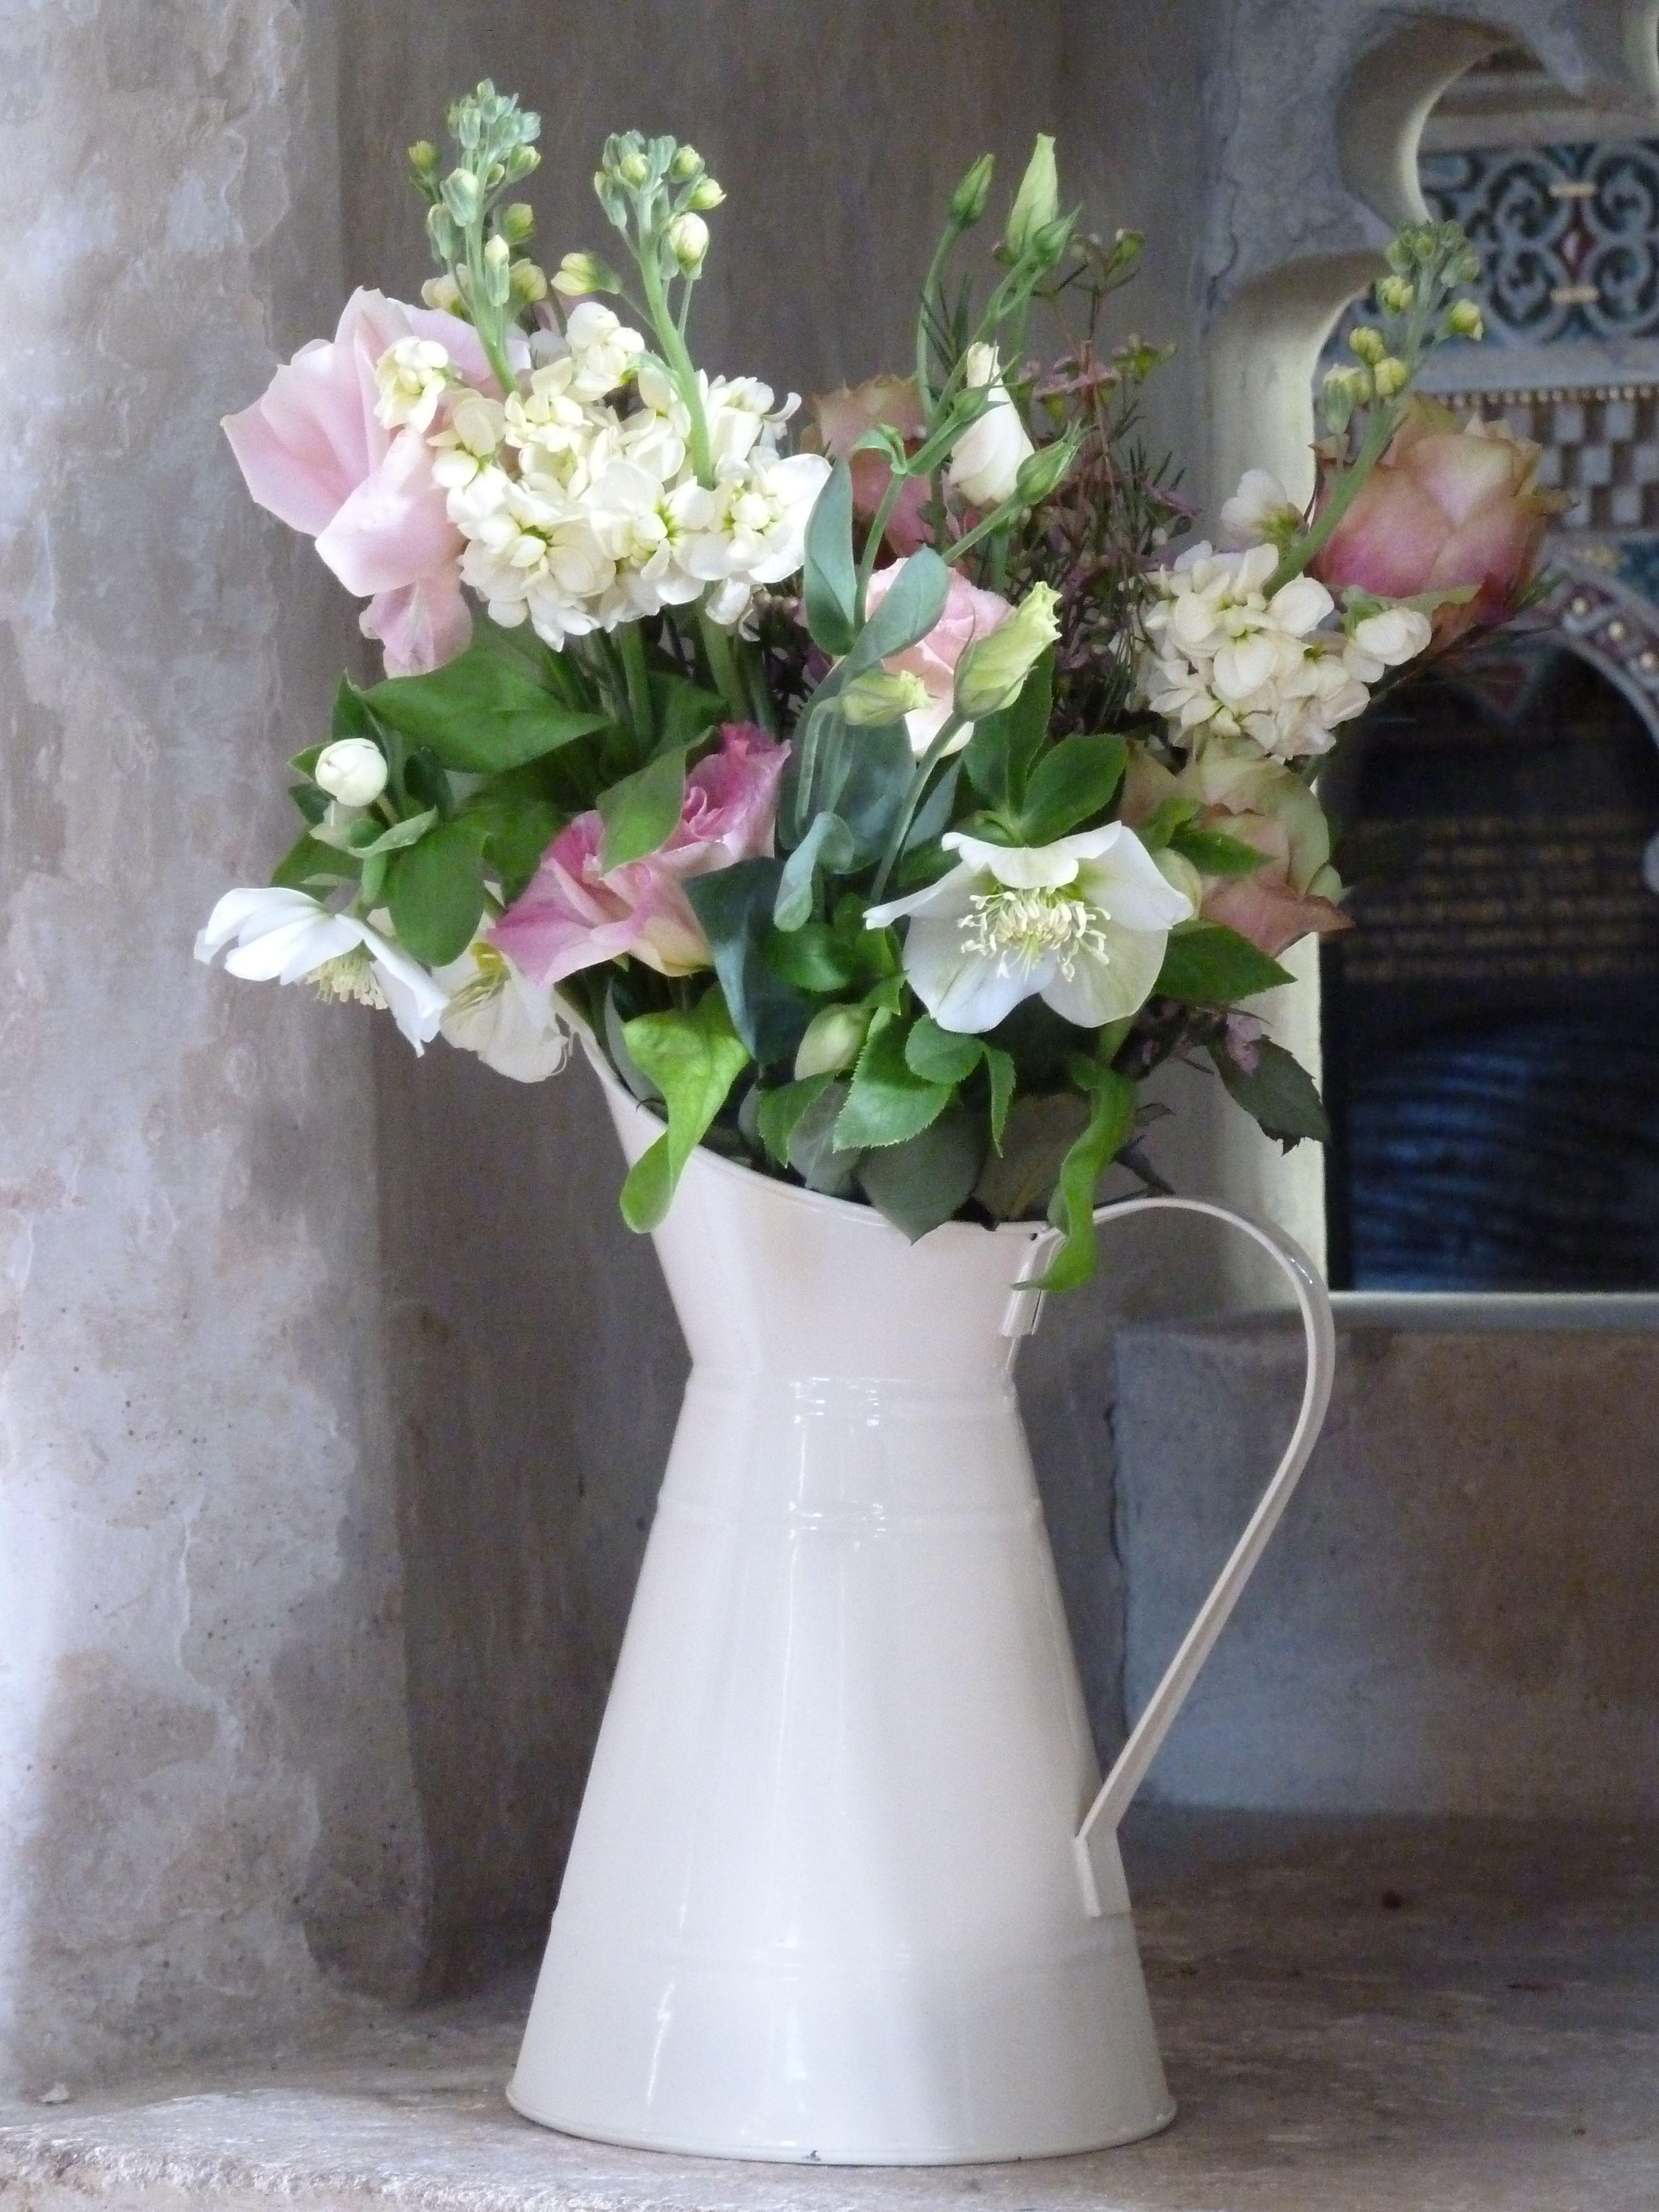 Vintage Jugs Of Flowers Including Stocks Lisianthus Hellebores